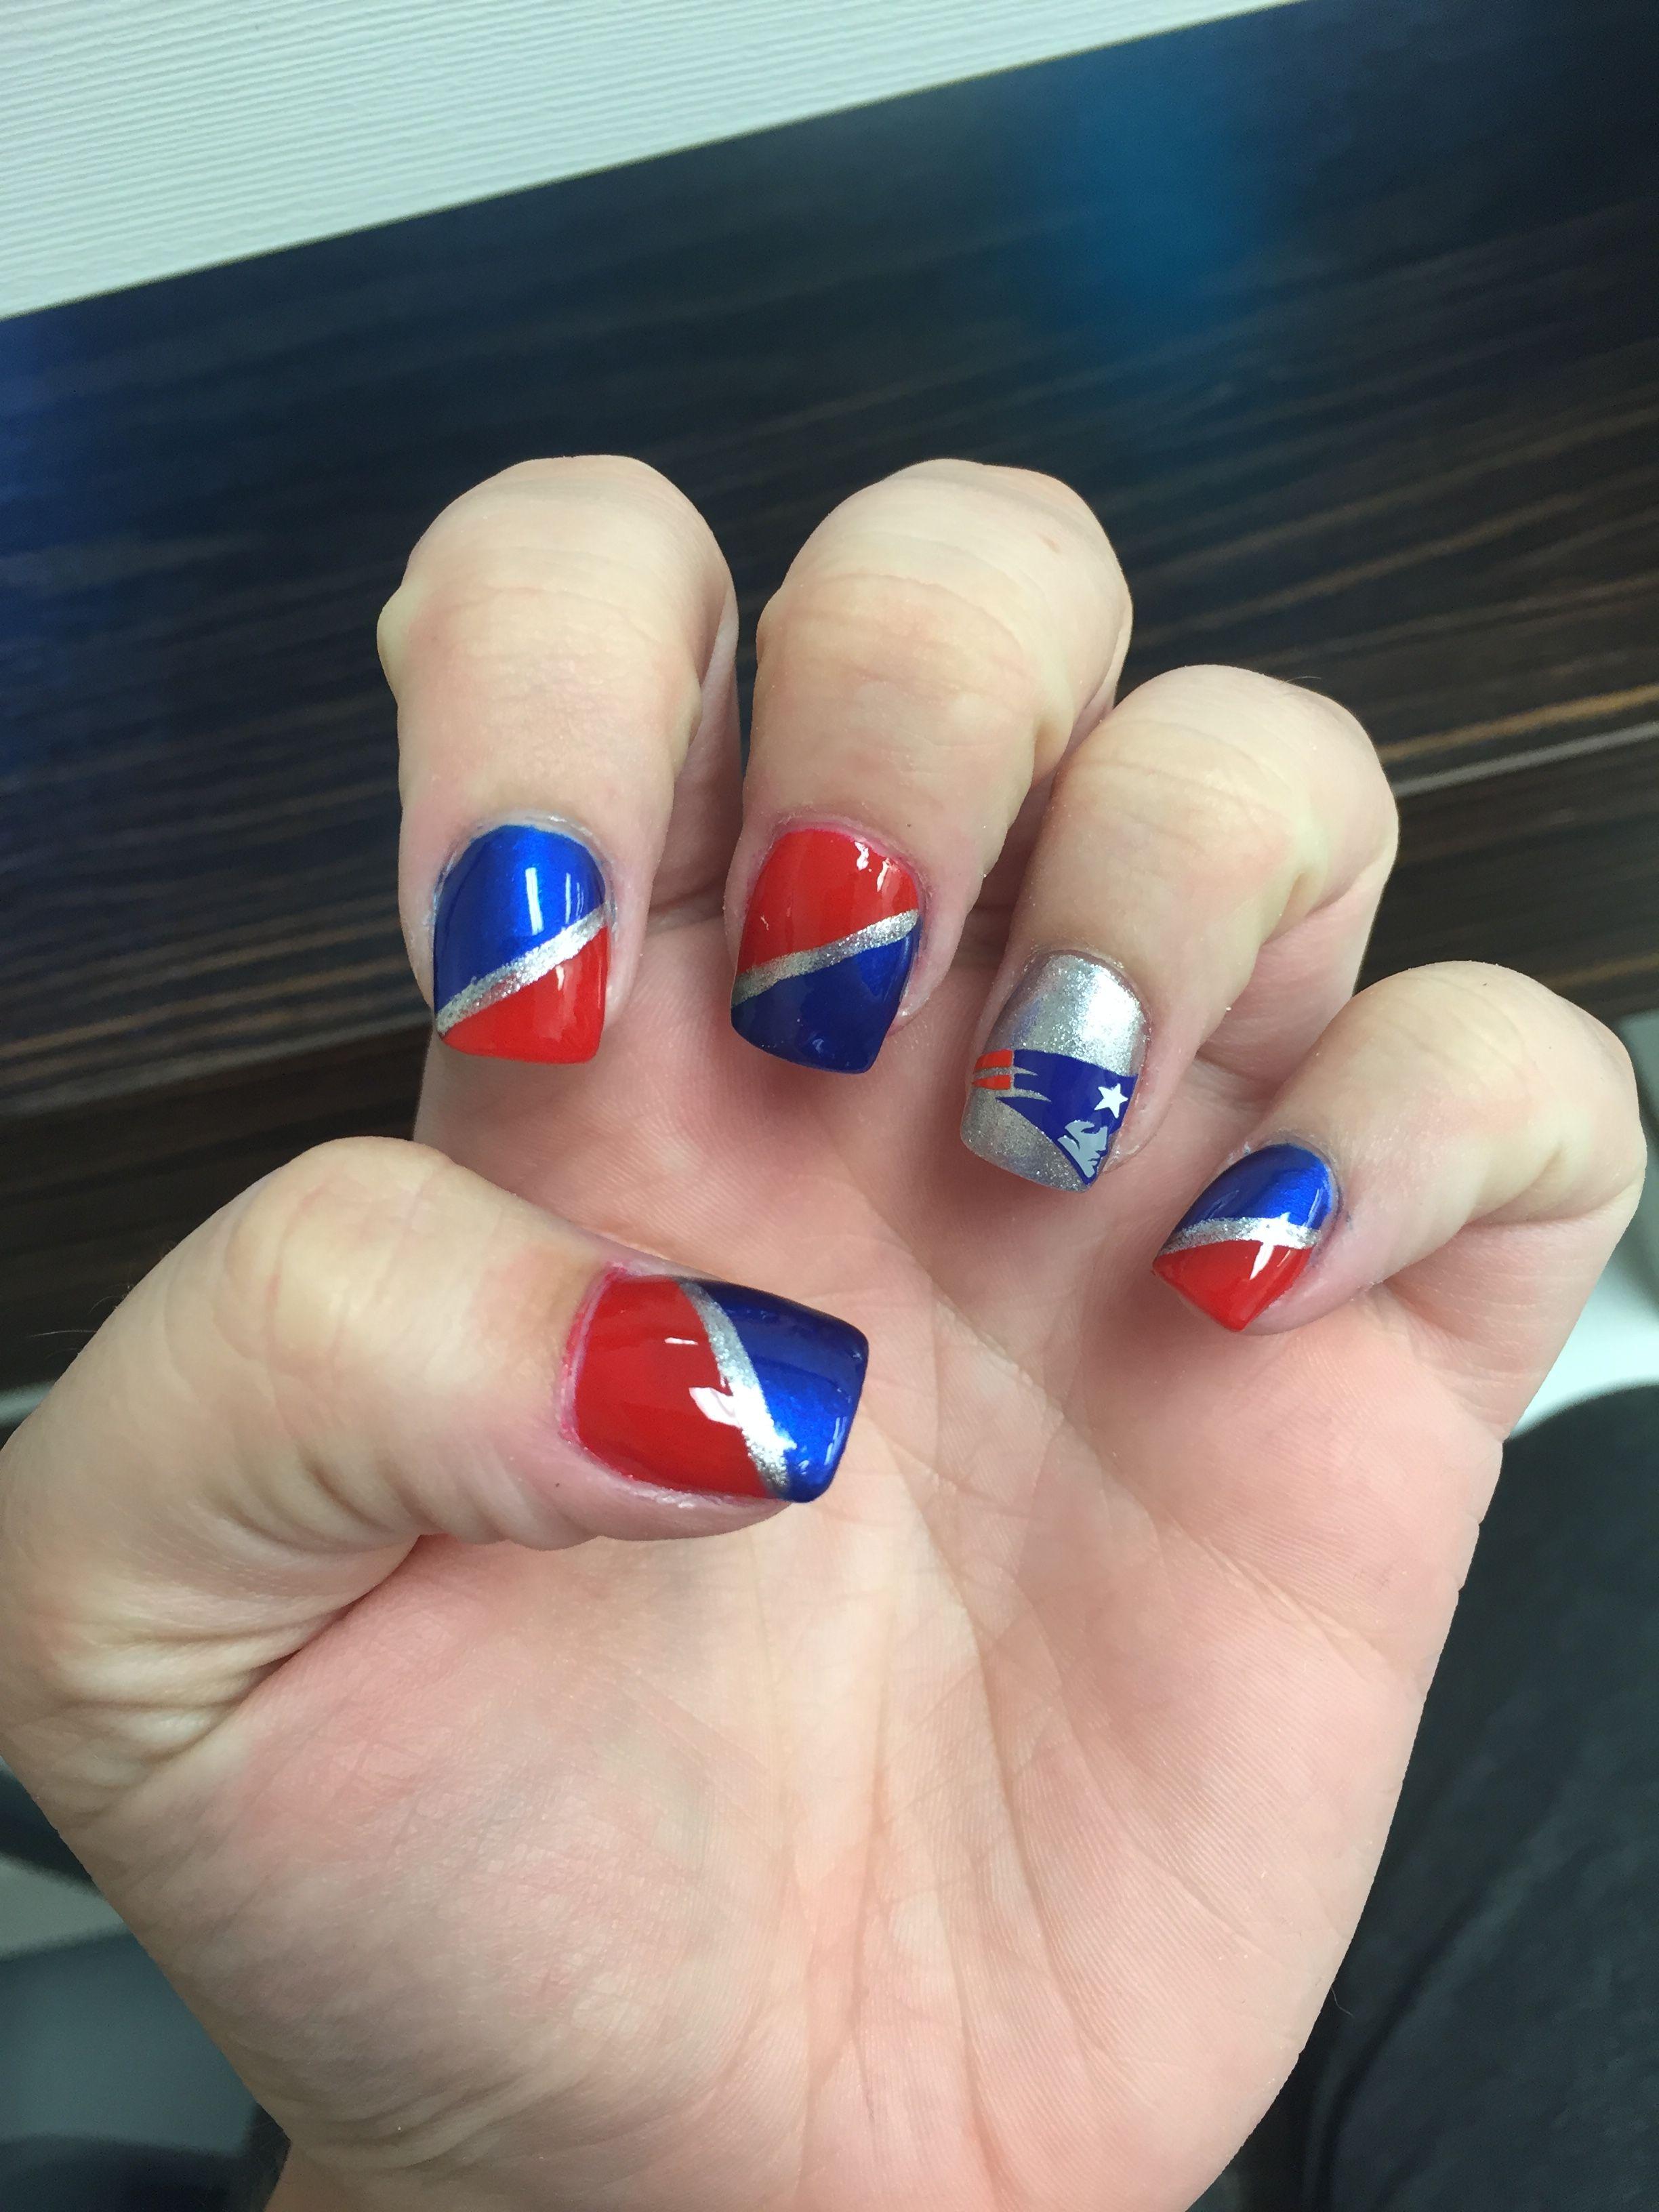 New England Patriots Nails Football Nails Patriotic Nails Patriotic Nails Design